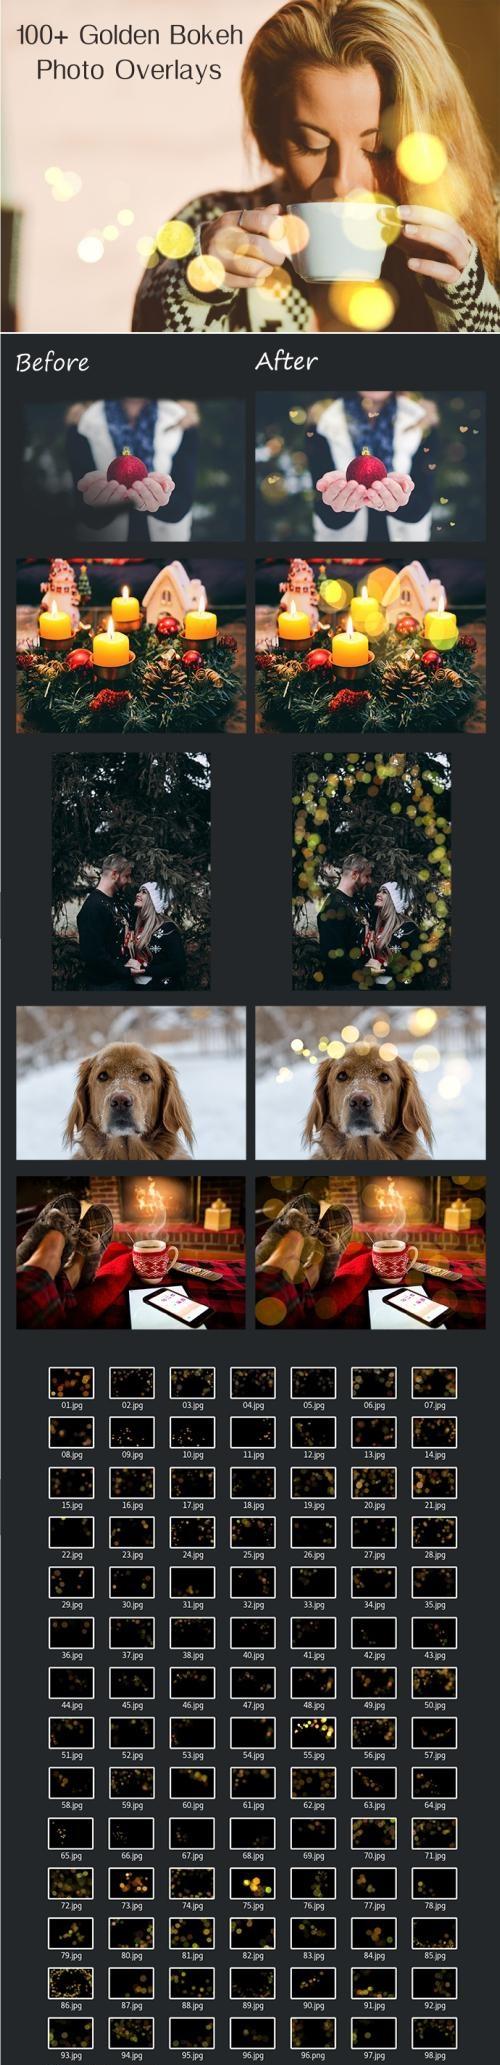 دانلود پک آماده : 100 Golden Bokeh Photo Overlays